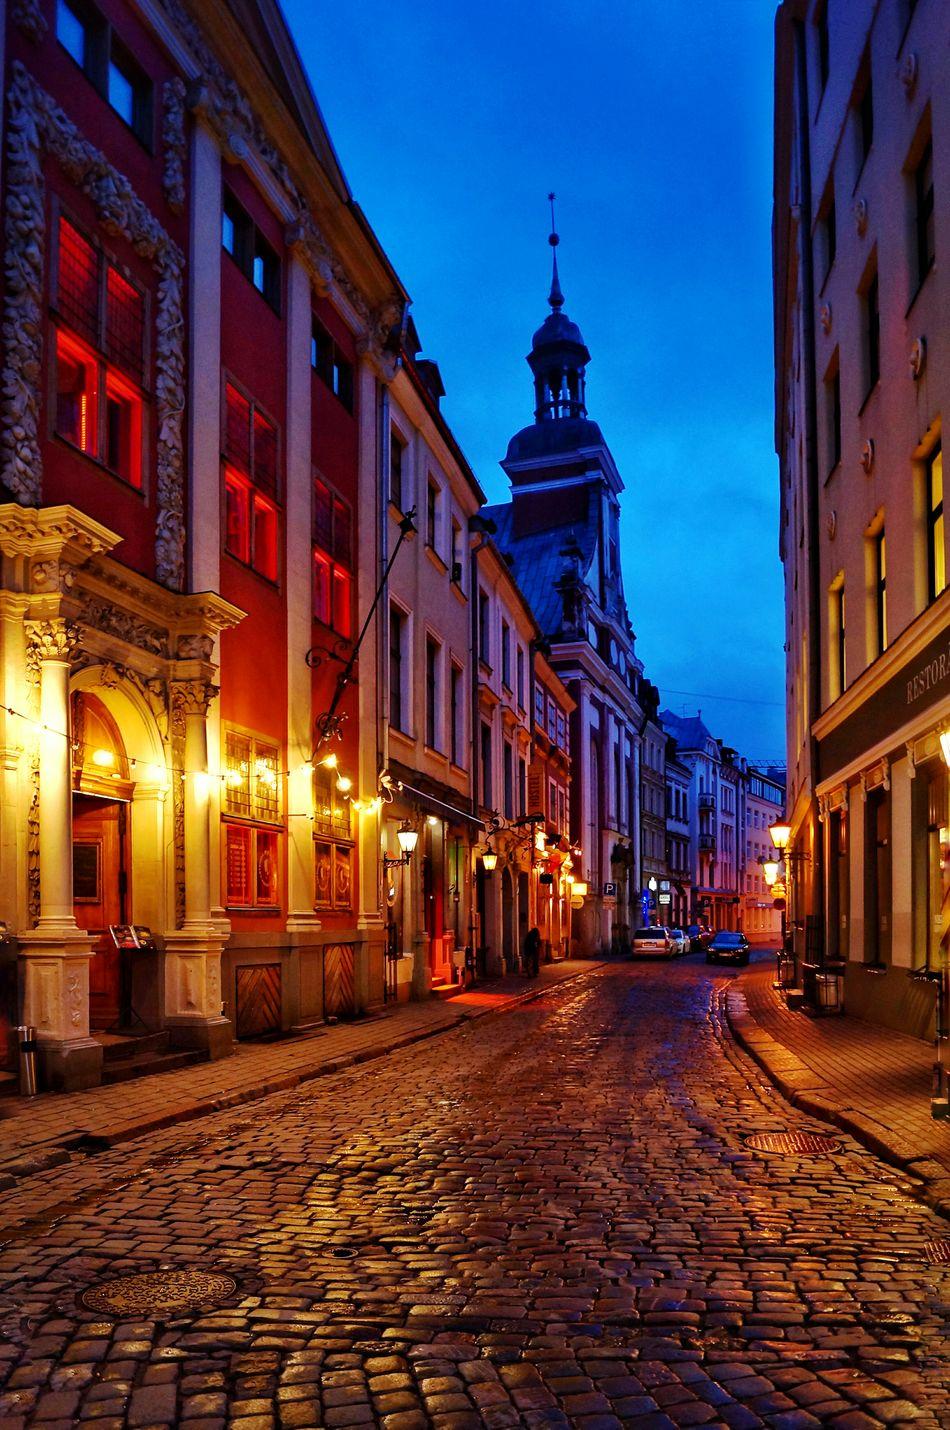 Riga Architecture Travel Destinations Cityscape Street Illuminated City Vacations Outdoors Building Exterior Night No People Sky Urban Skyline Riga Latvia City Cafe Place Setting Rigaplaces Window